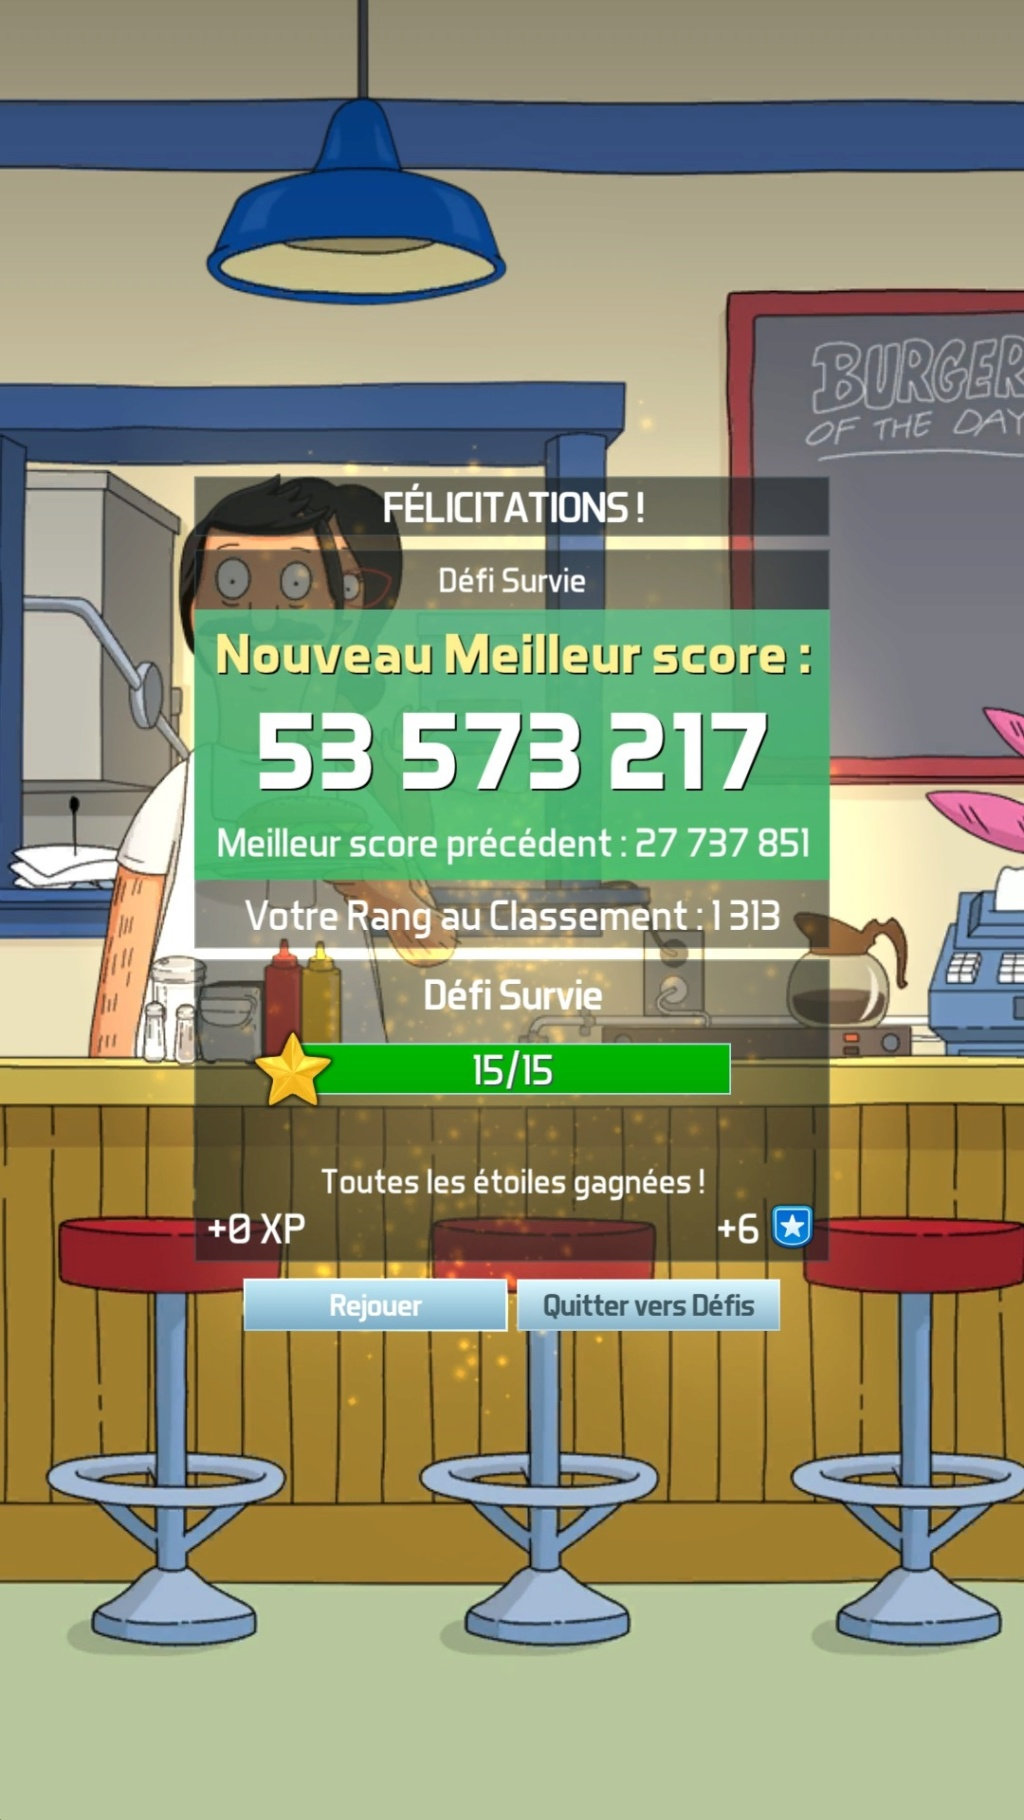 LUP's Club TdM 04.19 : Poissons d'avril • Fish Tales, Bob's Burgers, Family Guy 20190415